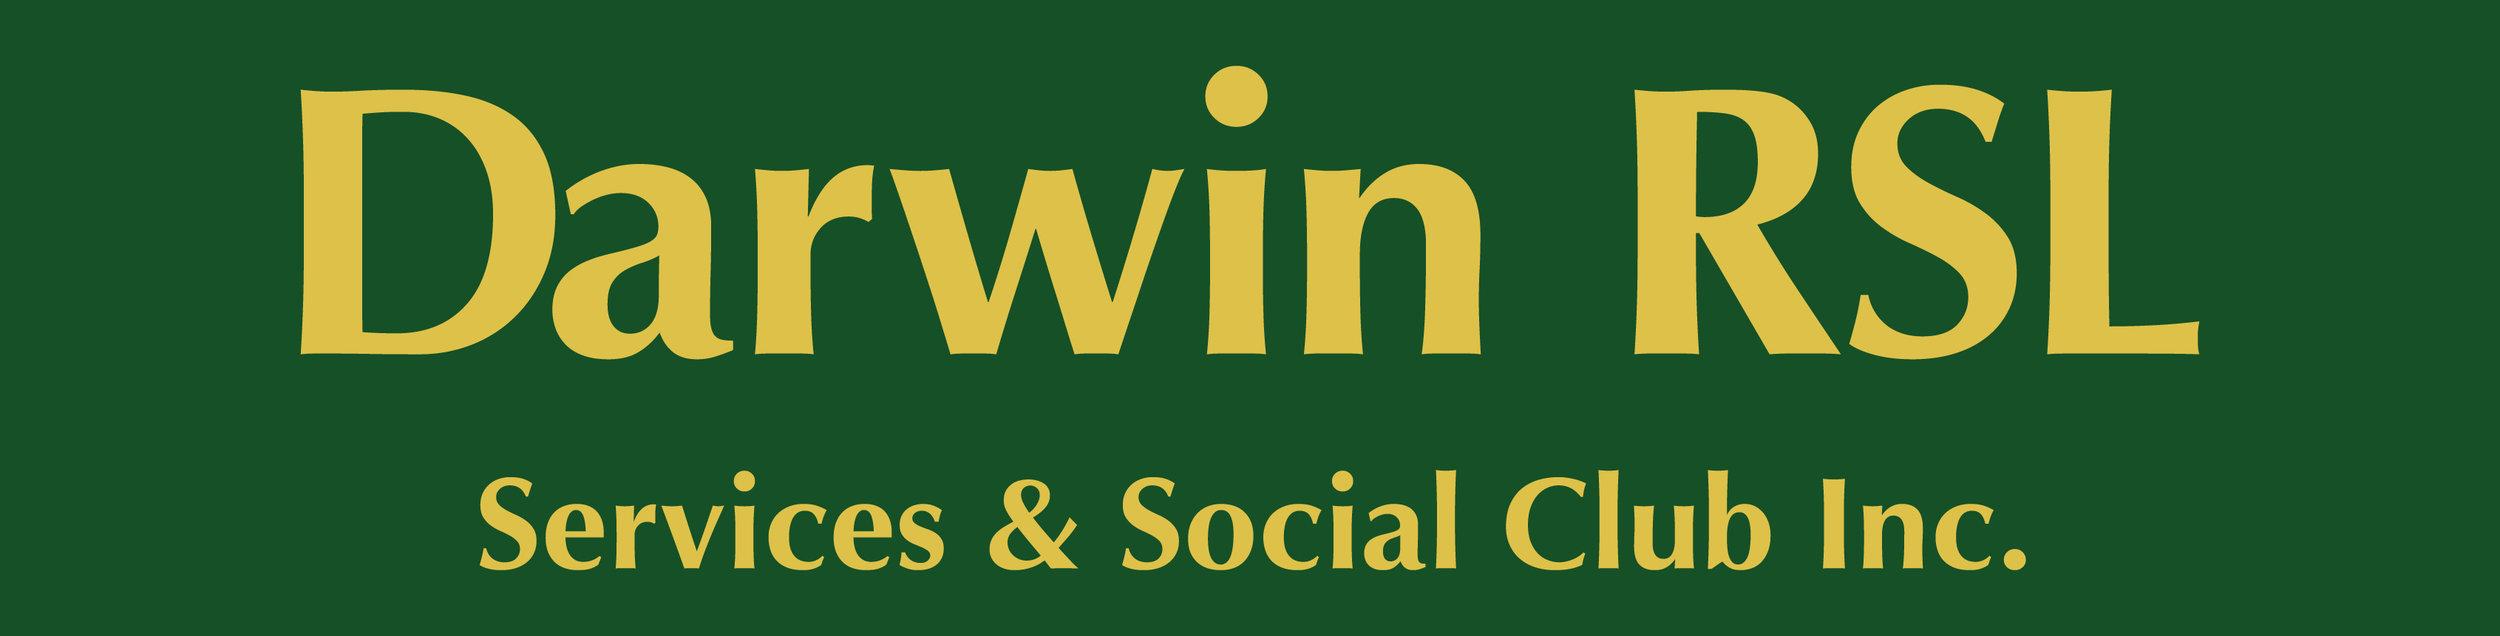 DARWIN RSL LOGO.jpg